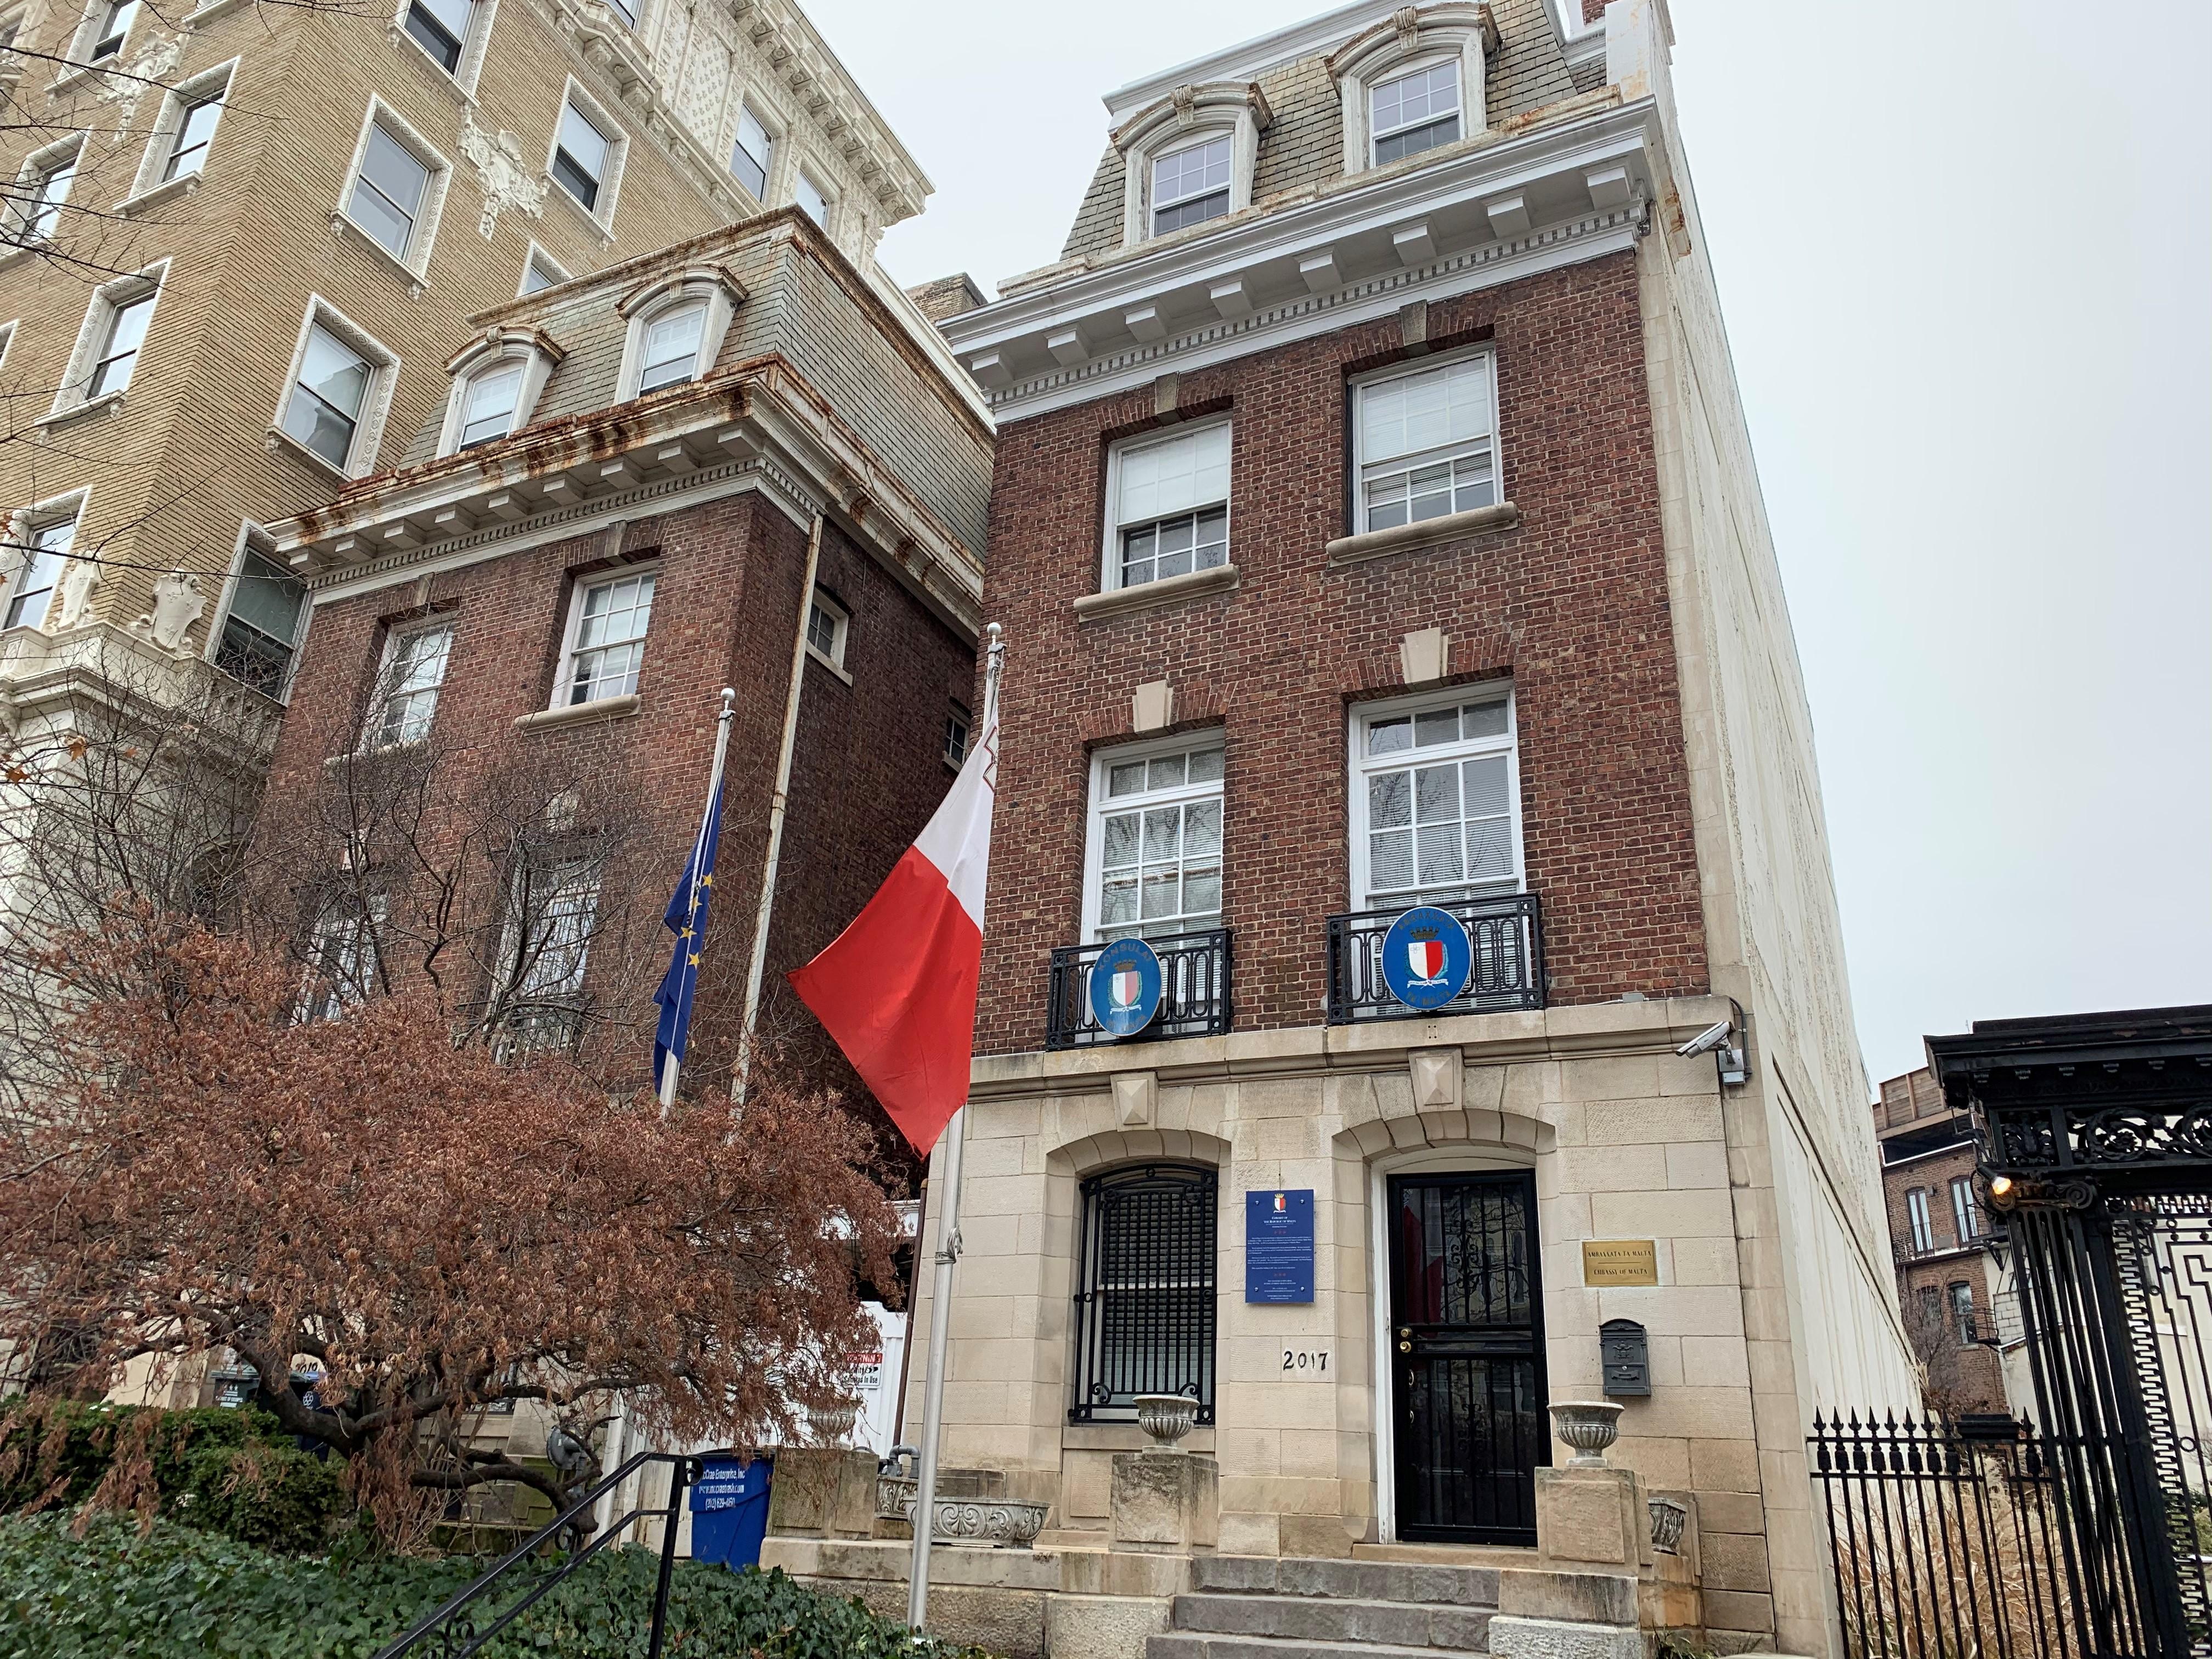 Real Estate and Homes For Sale Near the Embassy of Malta in Washington, DC. Artyom Shmatko Realtor